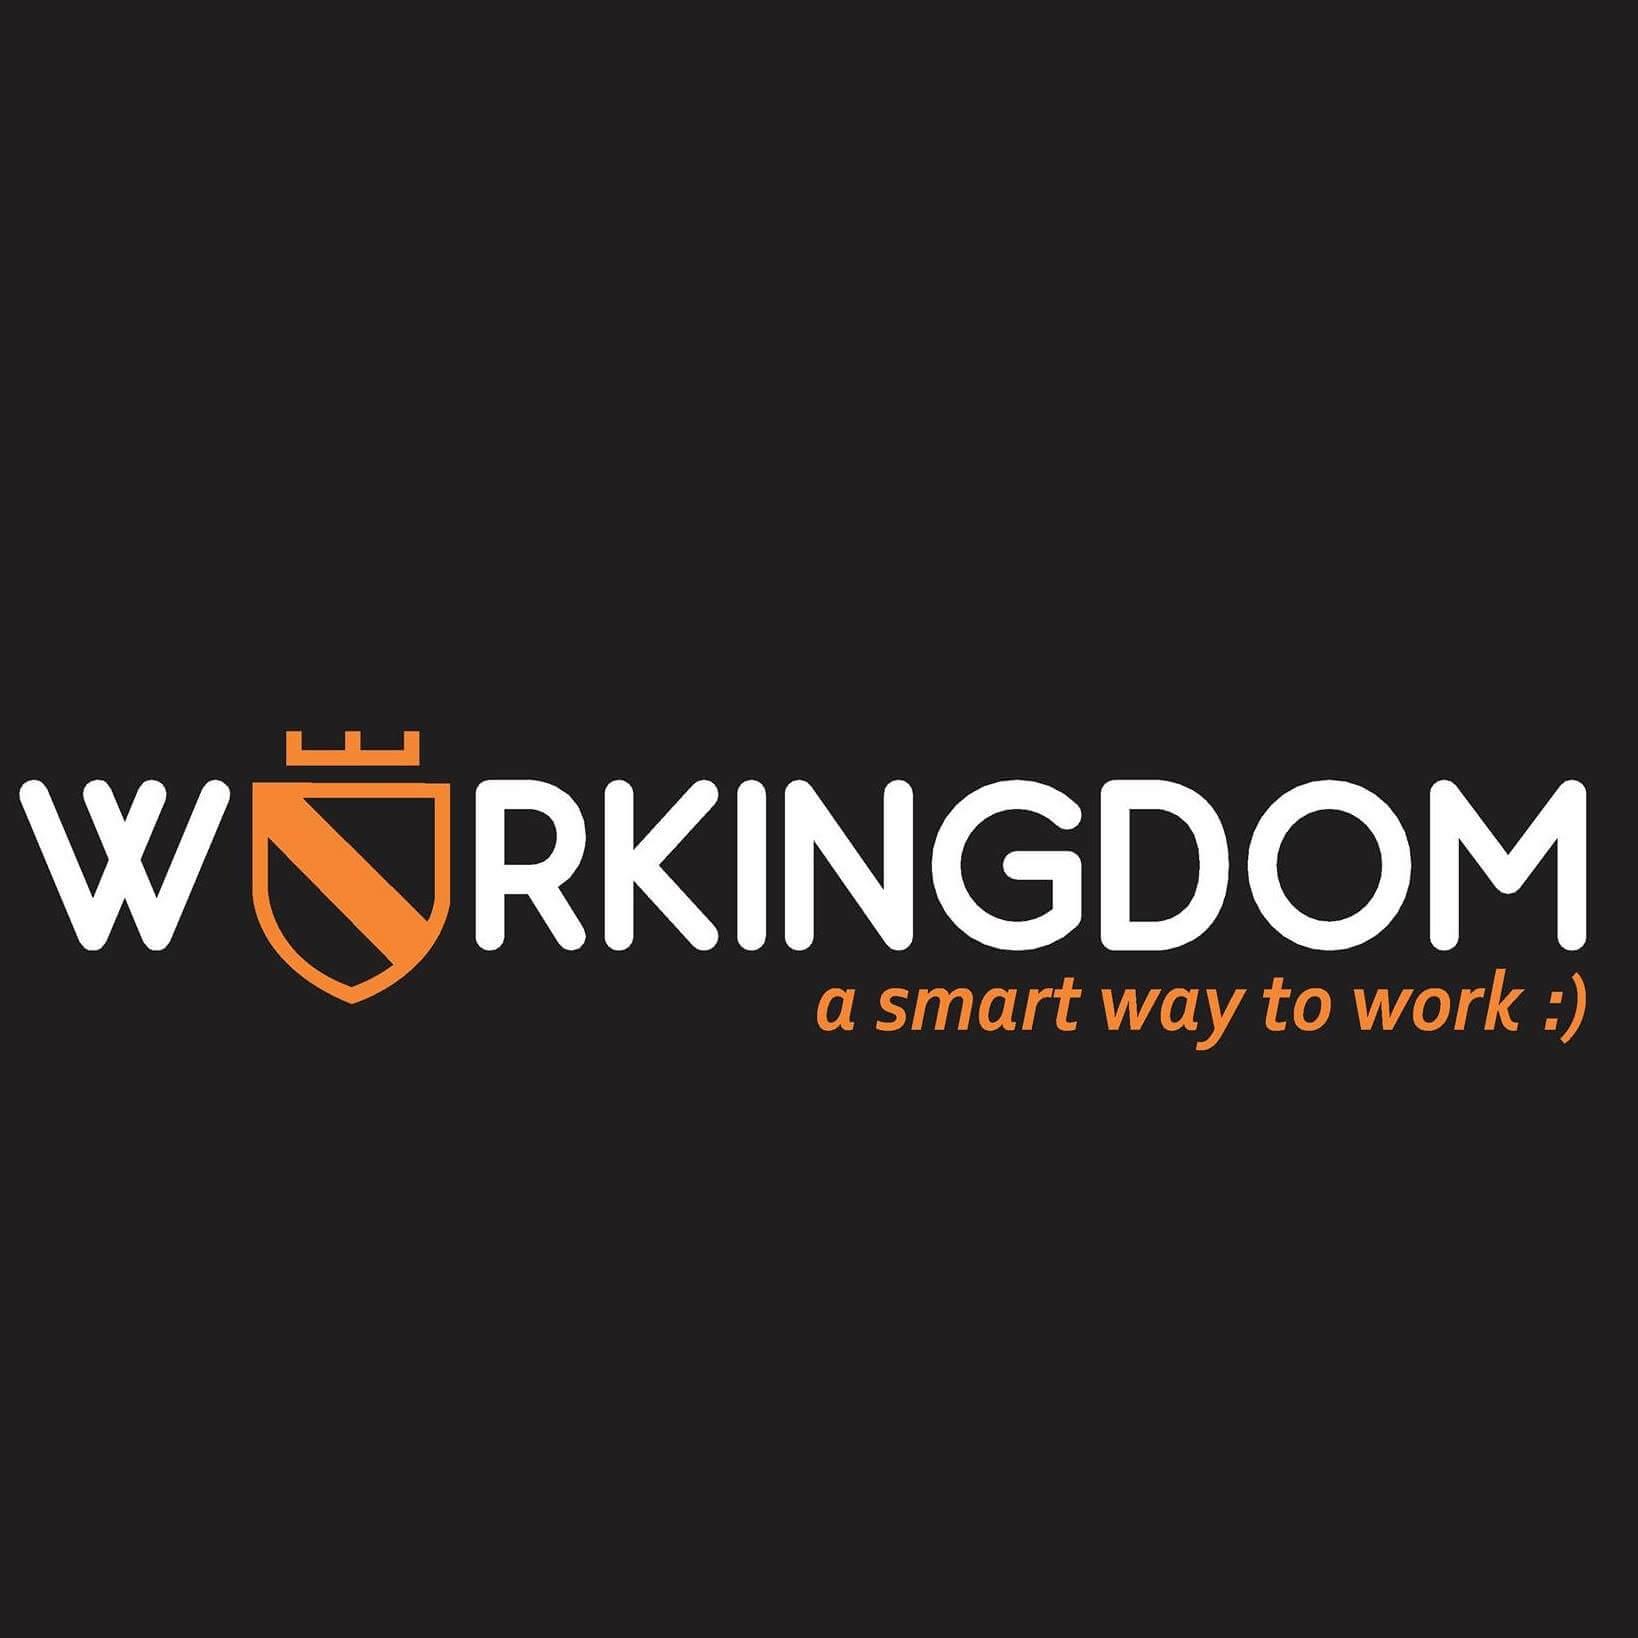 WORKINGDOM OFFICE SOLUTIONS PVT LTD | Bookofficenow